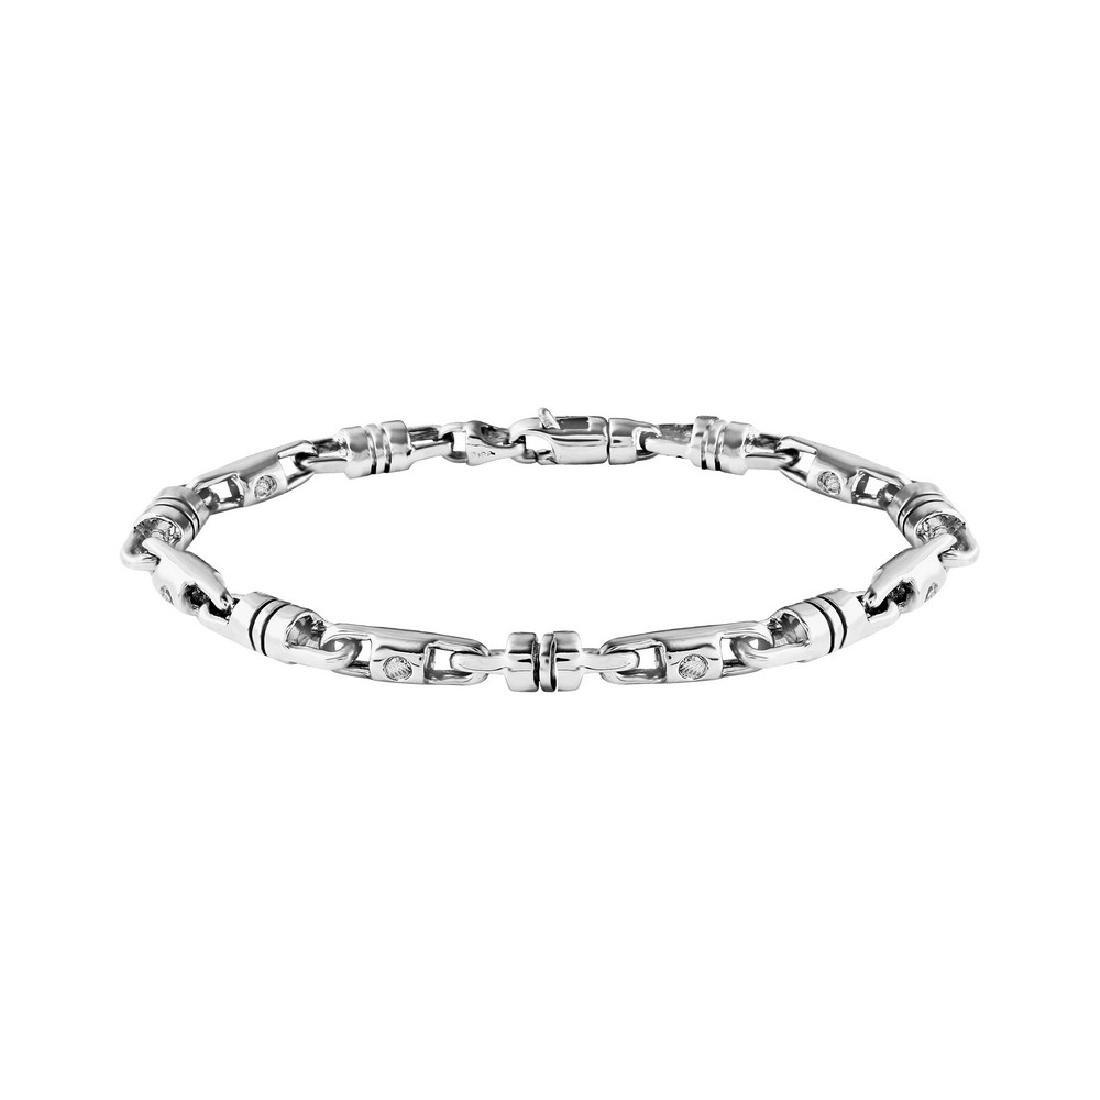 Genuine 2.97 TCW 14K White Gold Ladies Bracelet